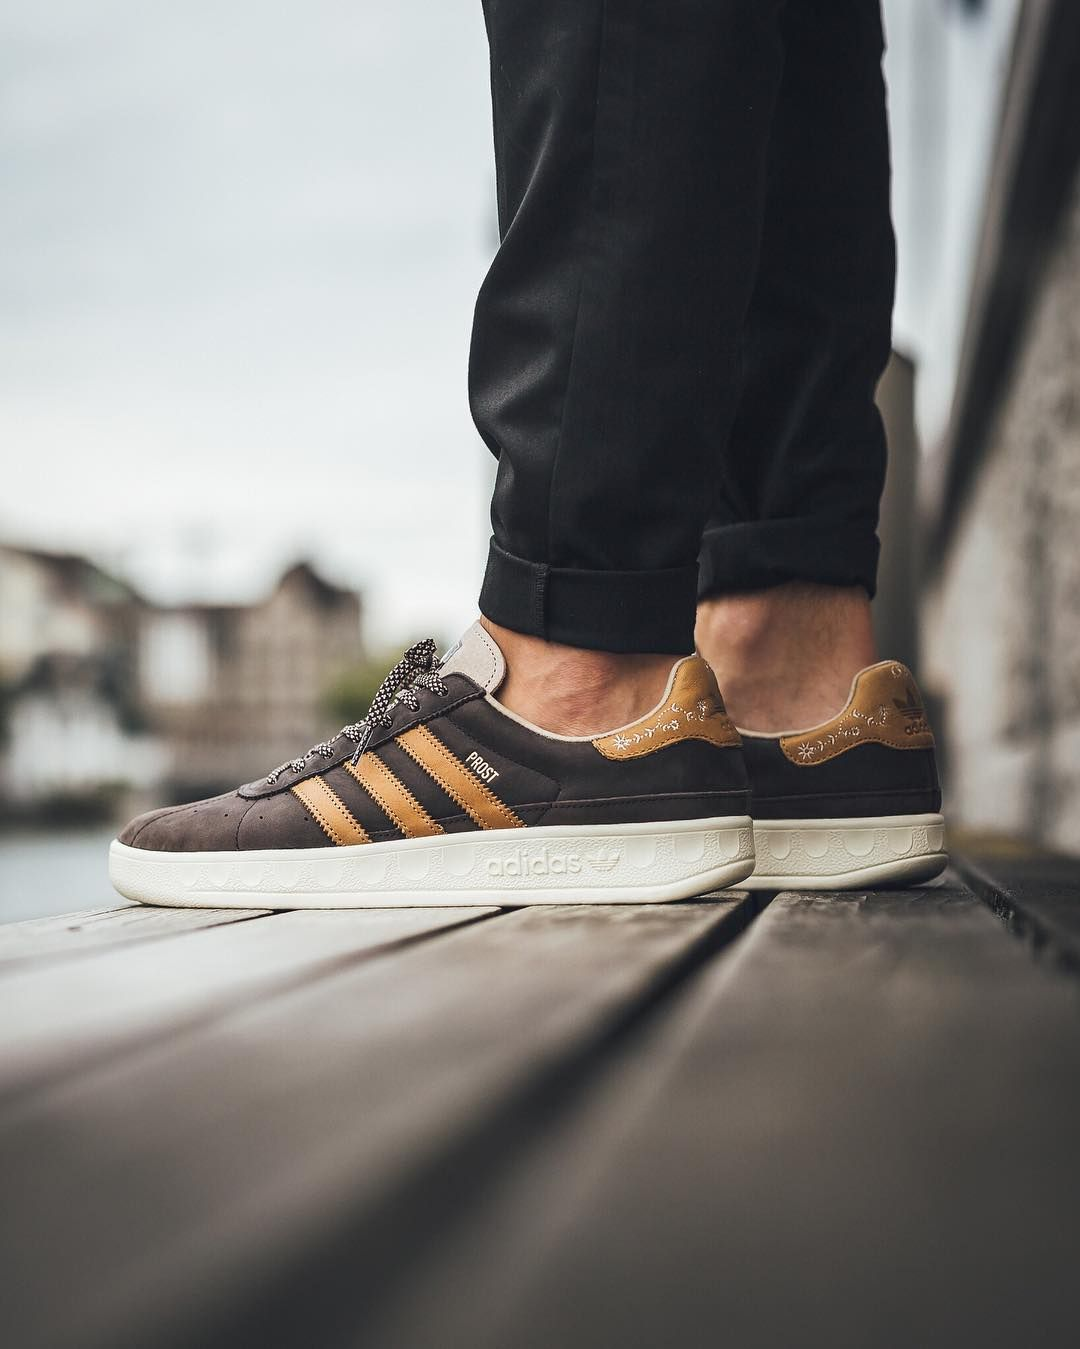 Adidas Prost 2